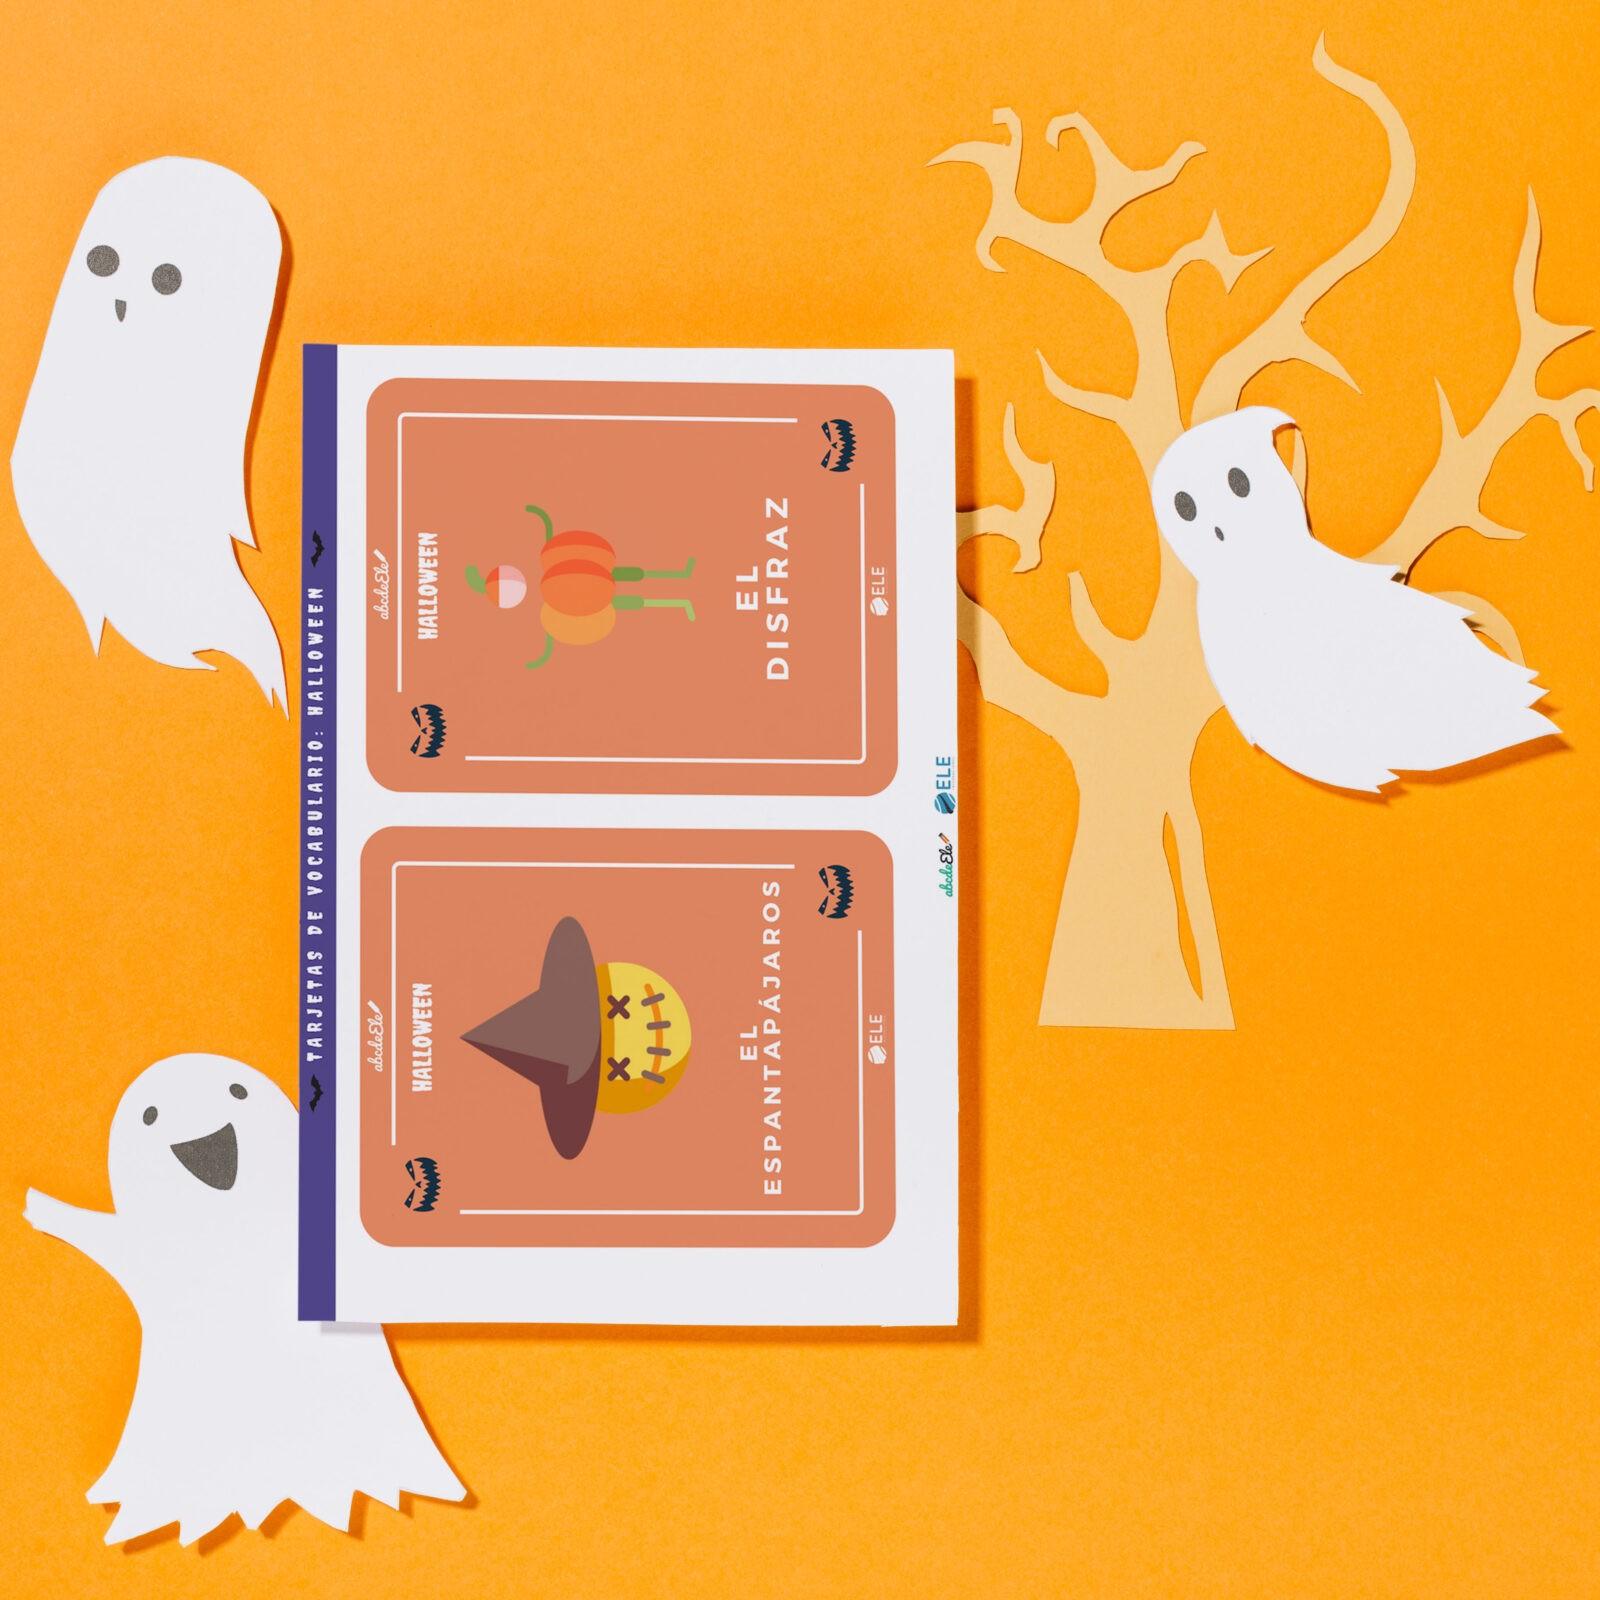 Tarjetas de vocabulario de Halloween [2 tarjetas gratuitas]